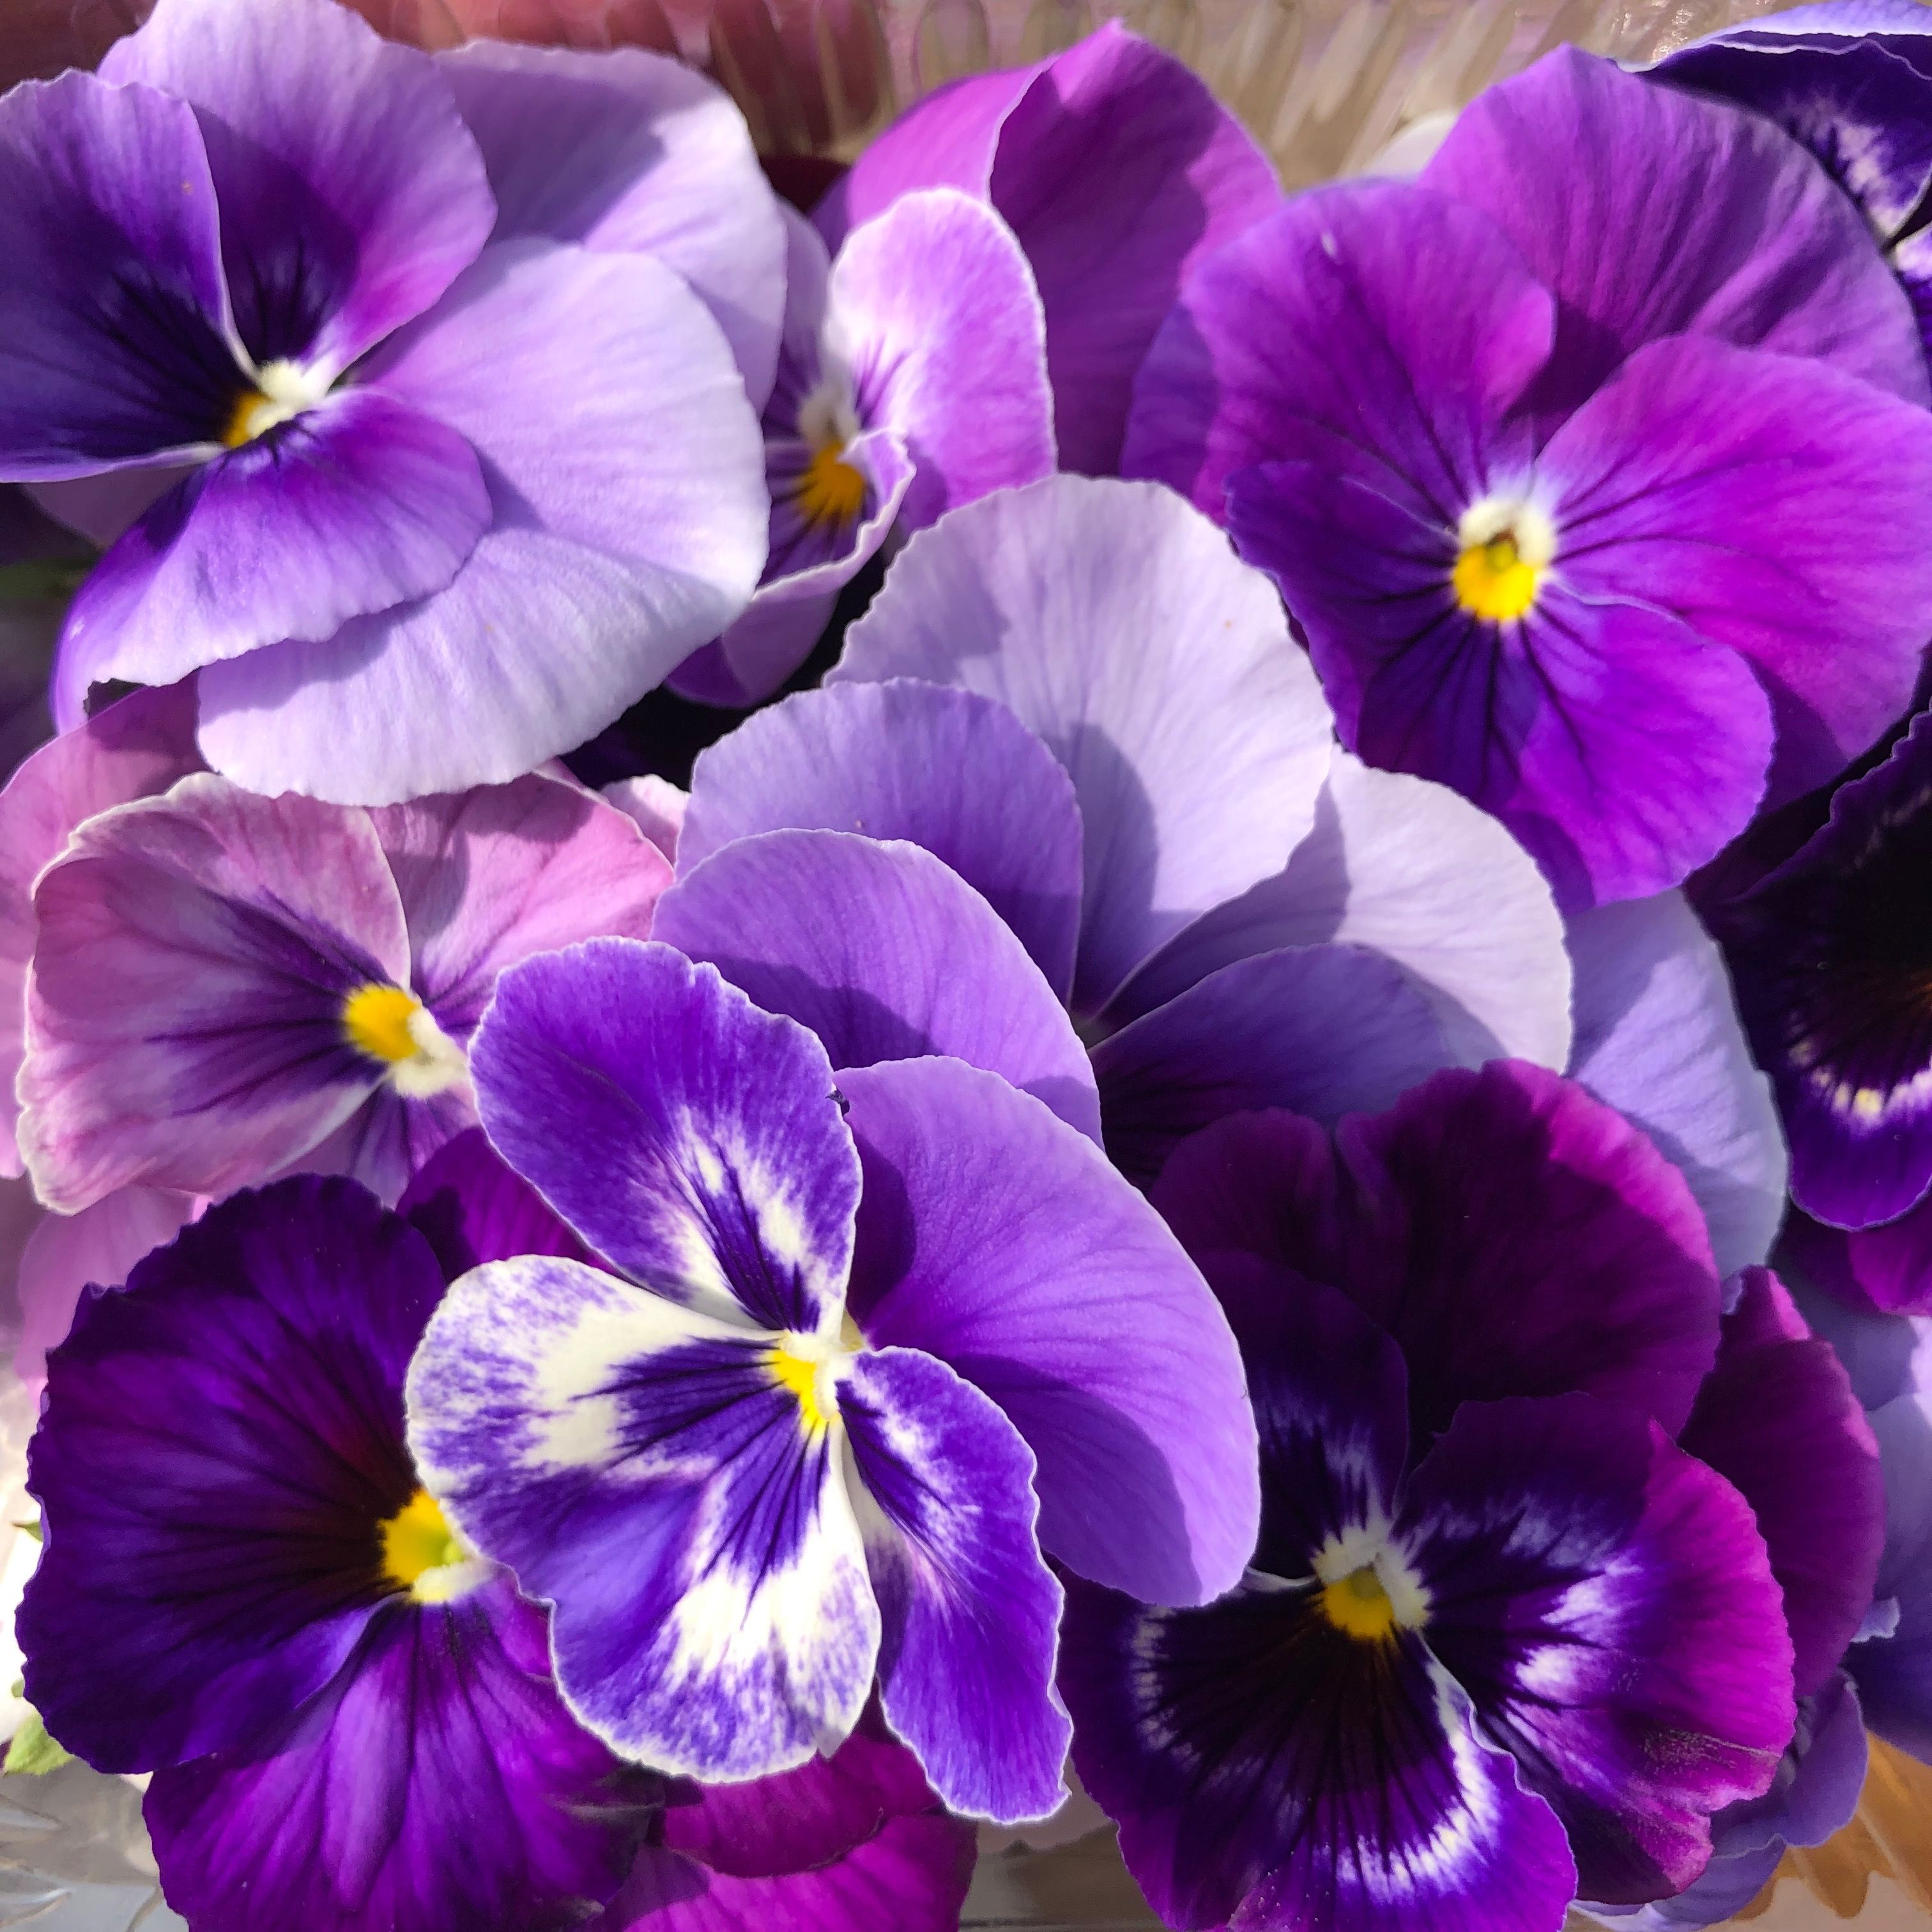 Edible Flowers Organic Pansies Organic Edibleflowers Soilassociation Certified Purple Biritishflowers Edible Flowers Purple Flowers Pansies Flowers